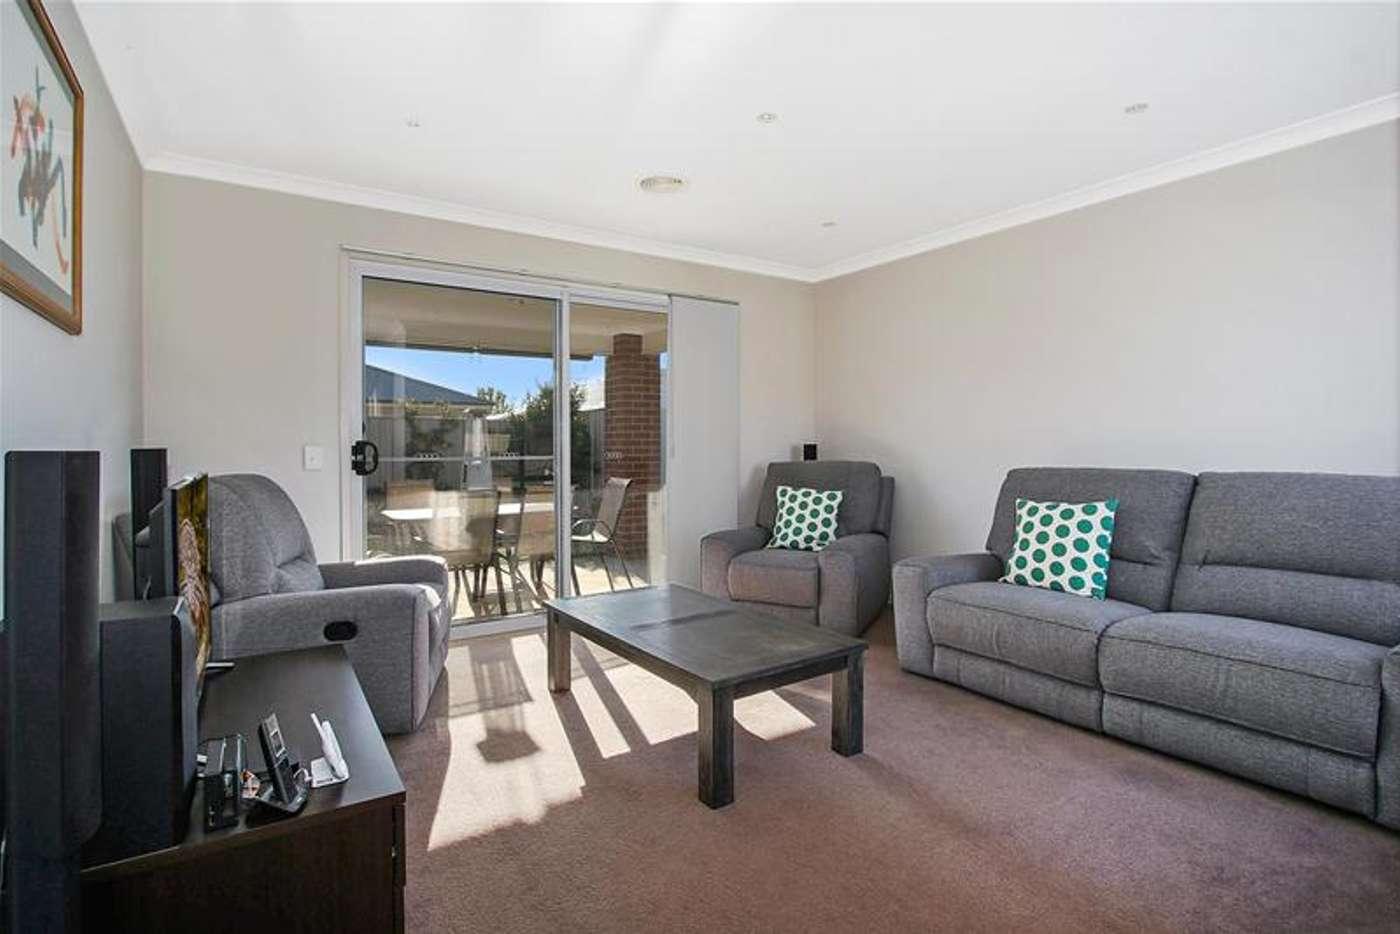 Sixth view of Homely house listing, 13 Bugden Street, Wodonga VIC 3690